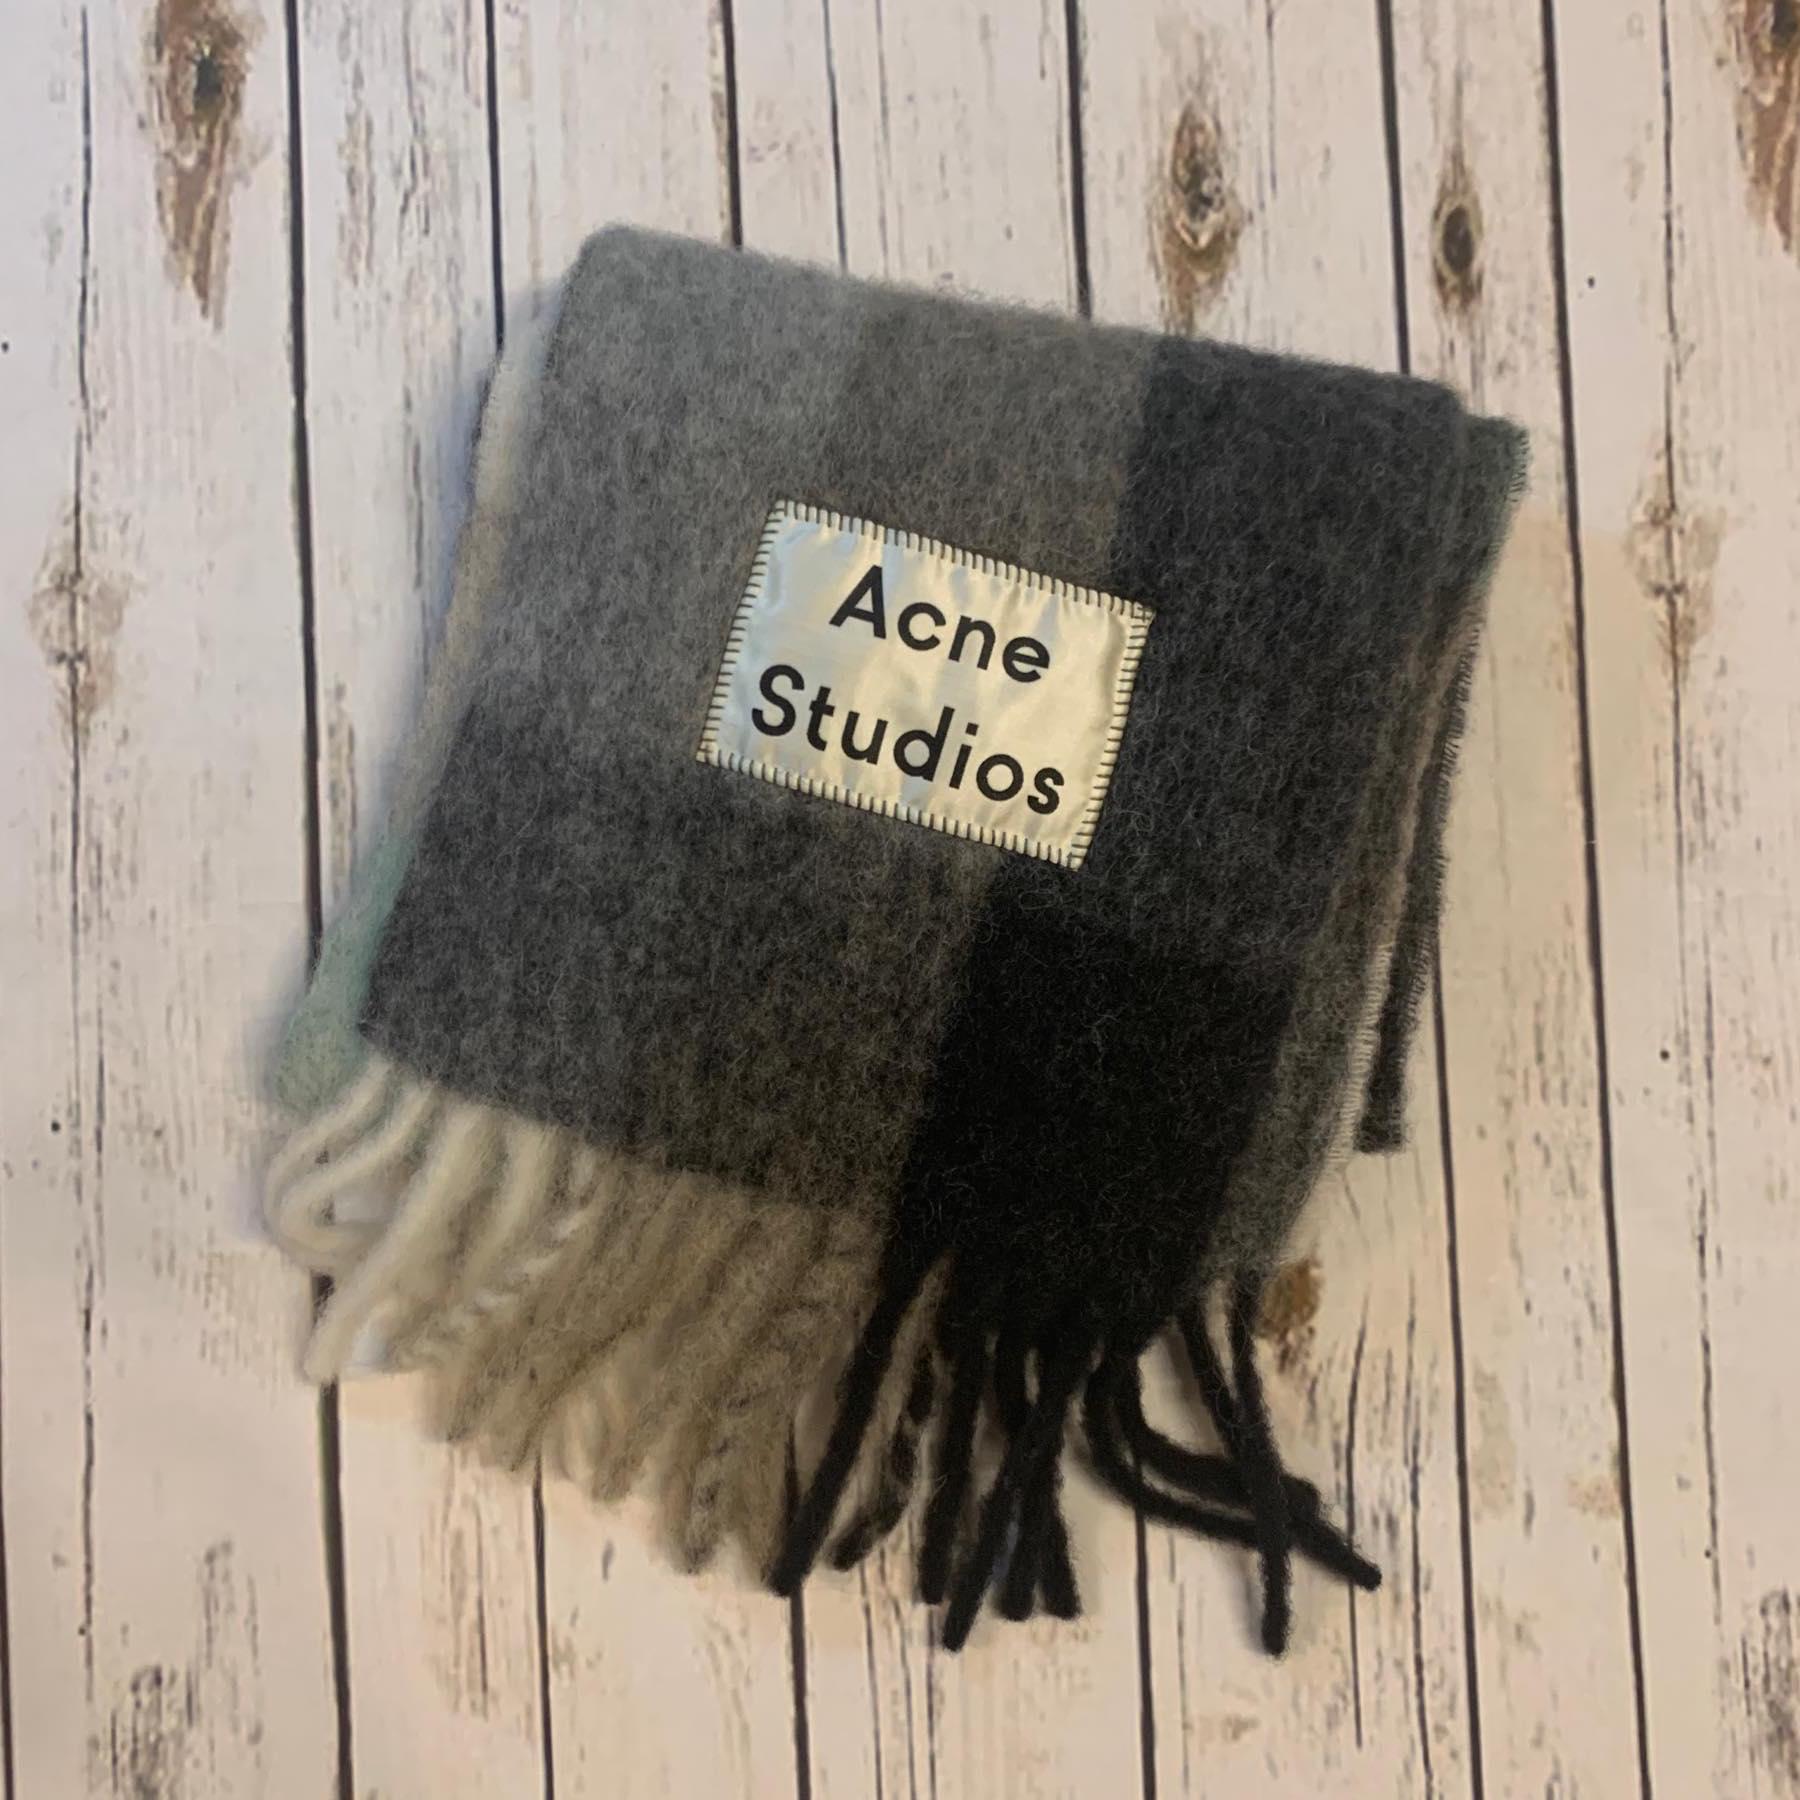 ACNE STUDIOS(アクネ ストゥディオズ) マルチチェックマフラー